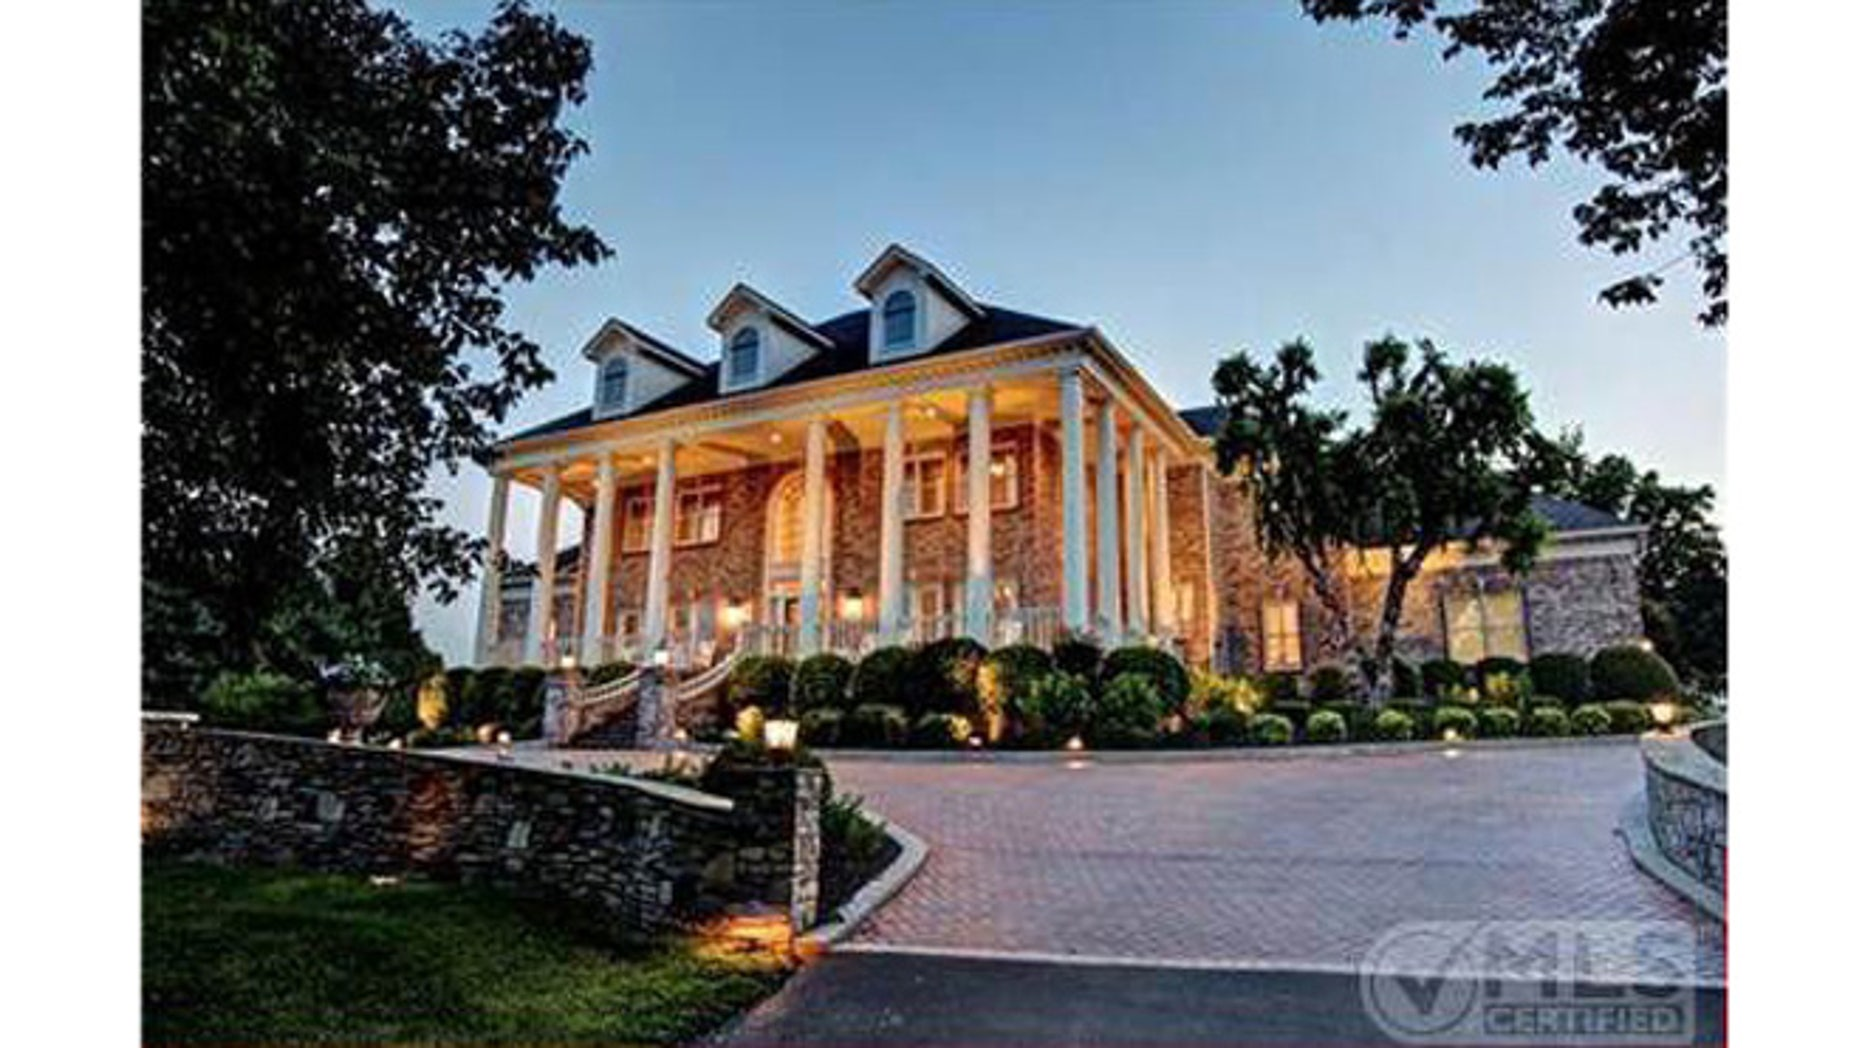 George Jones' Nashville home.